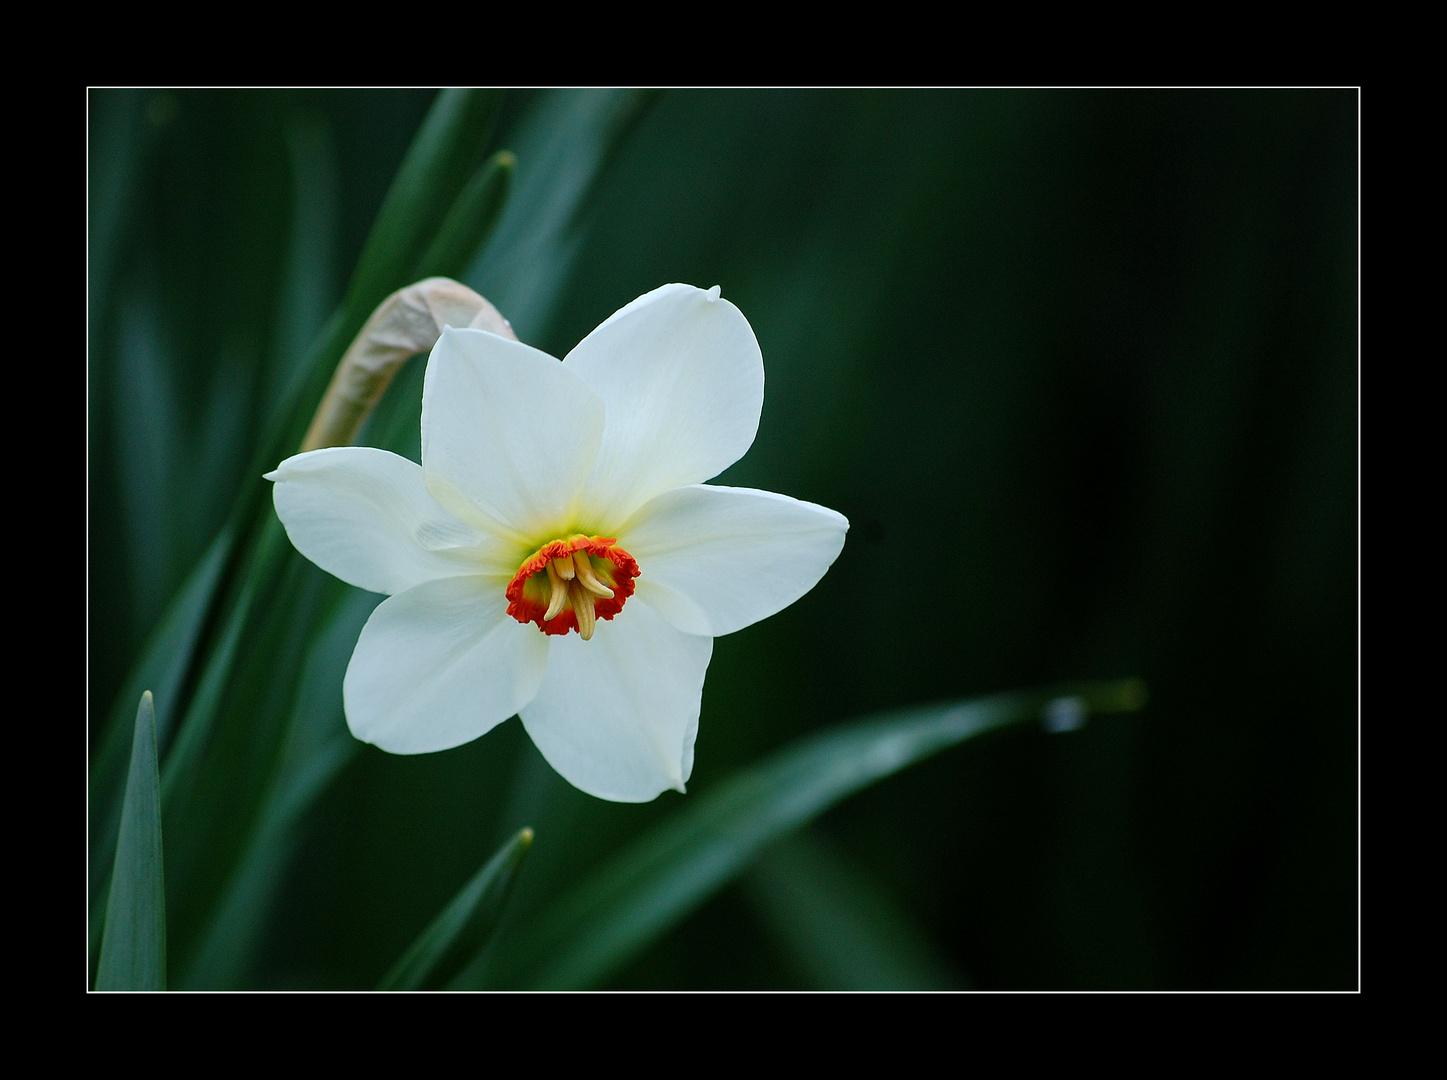 Frühlingsmorgen im Schlosspark - Nr. 2